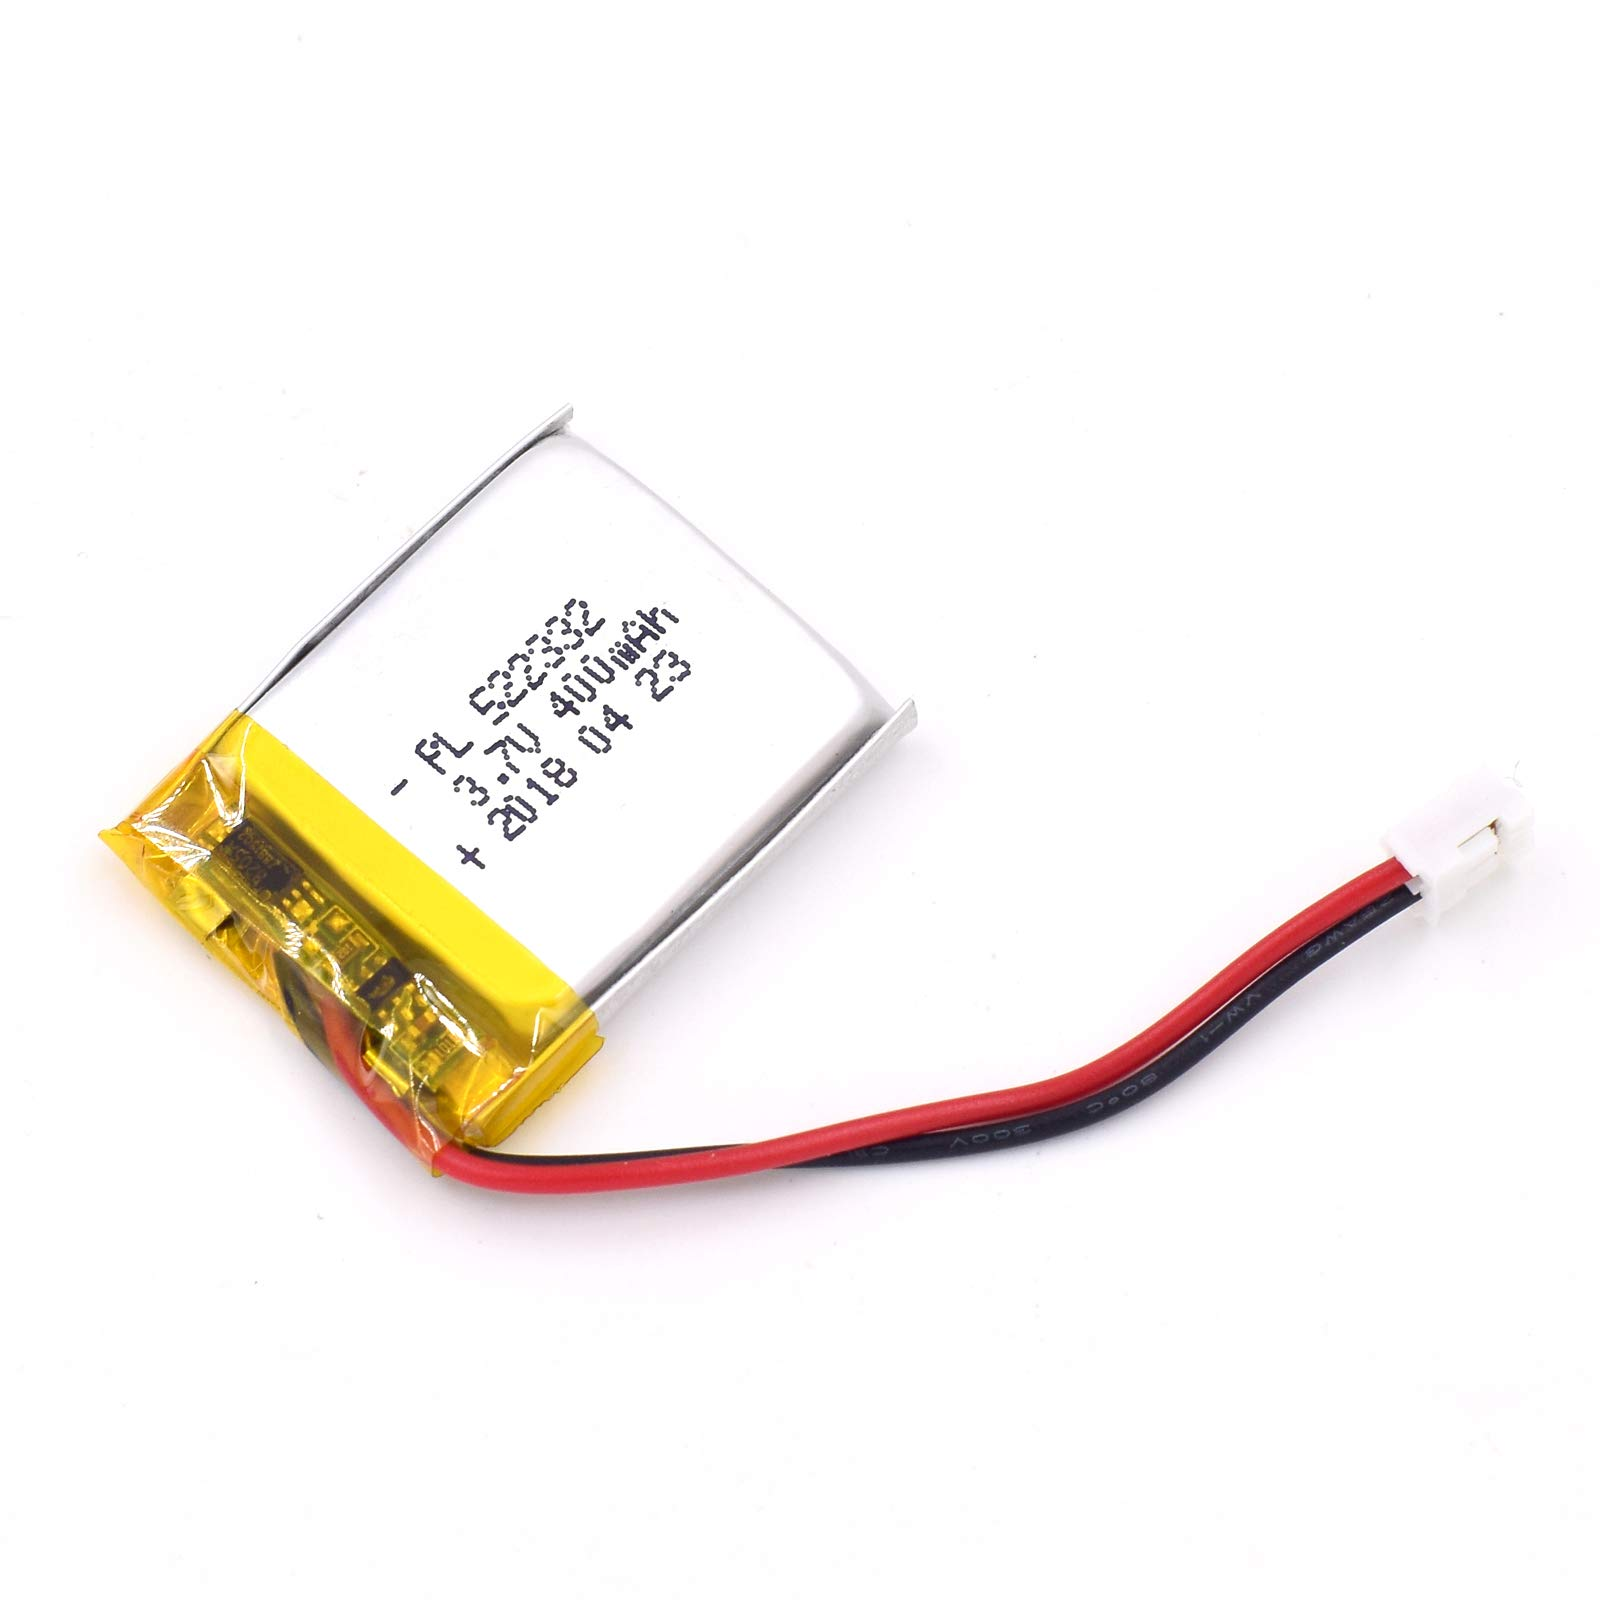 Bateria Lipo 3.7V 400mAh 522332 Recargable JST Conector